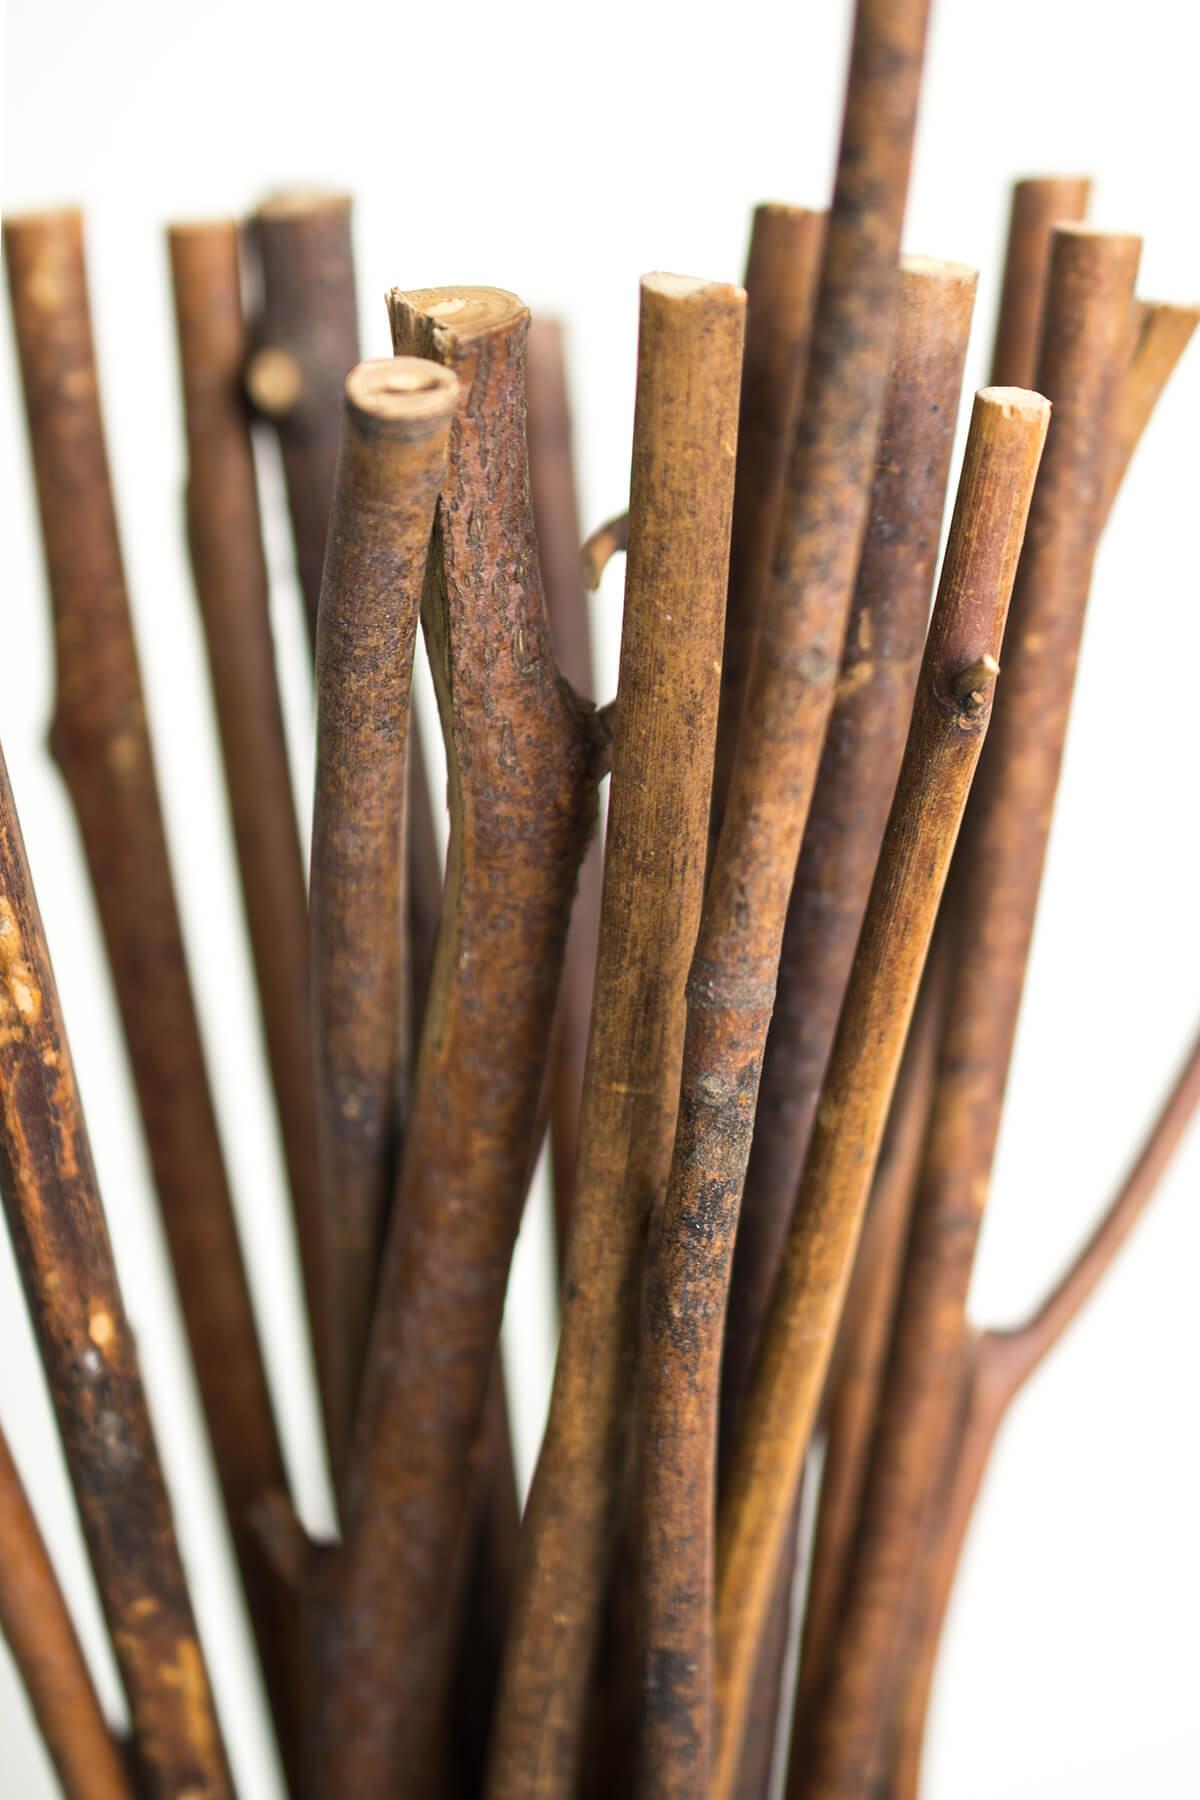 Bundle of  Sticks 13in 1.5lbs